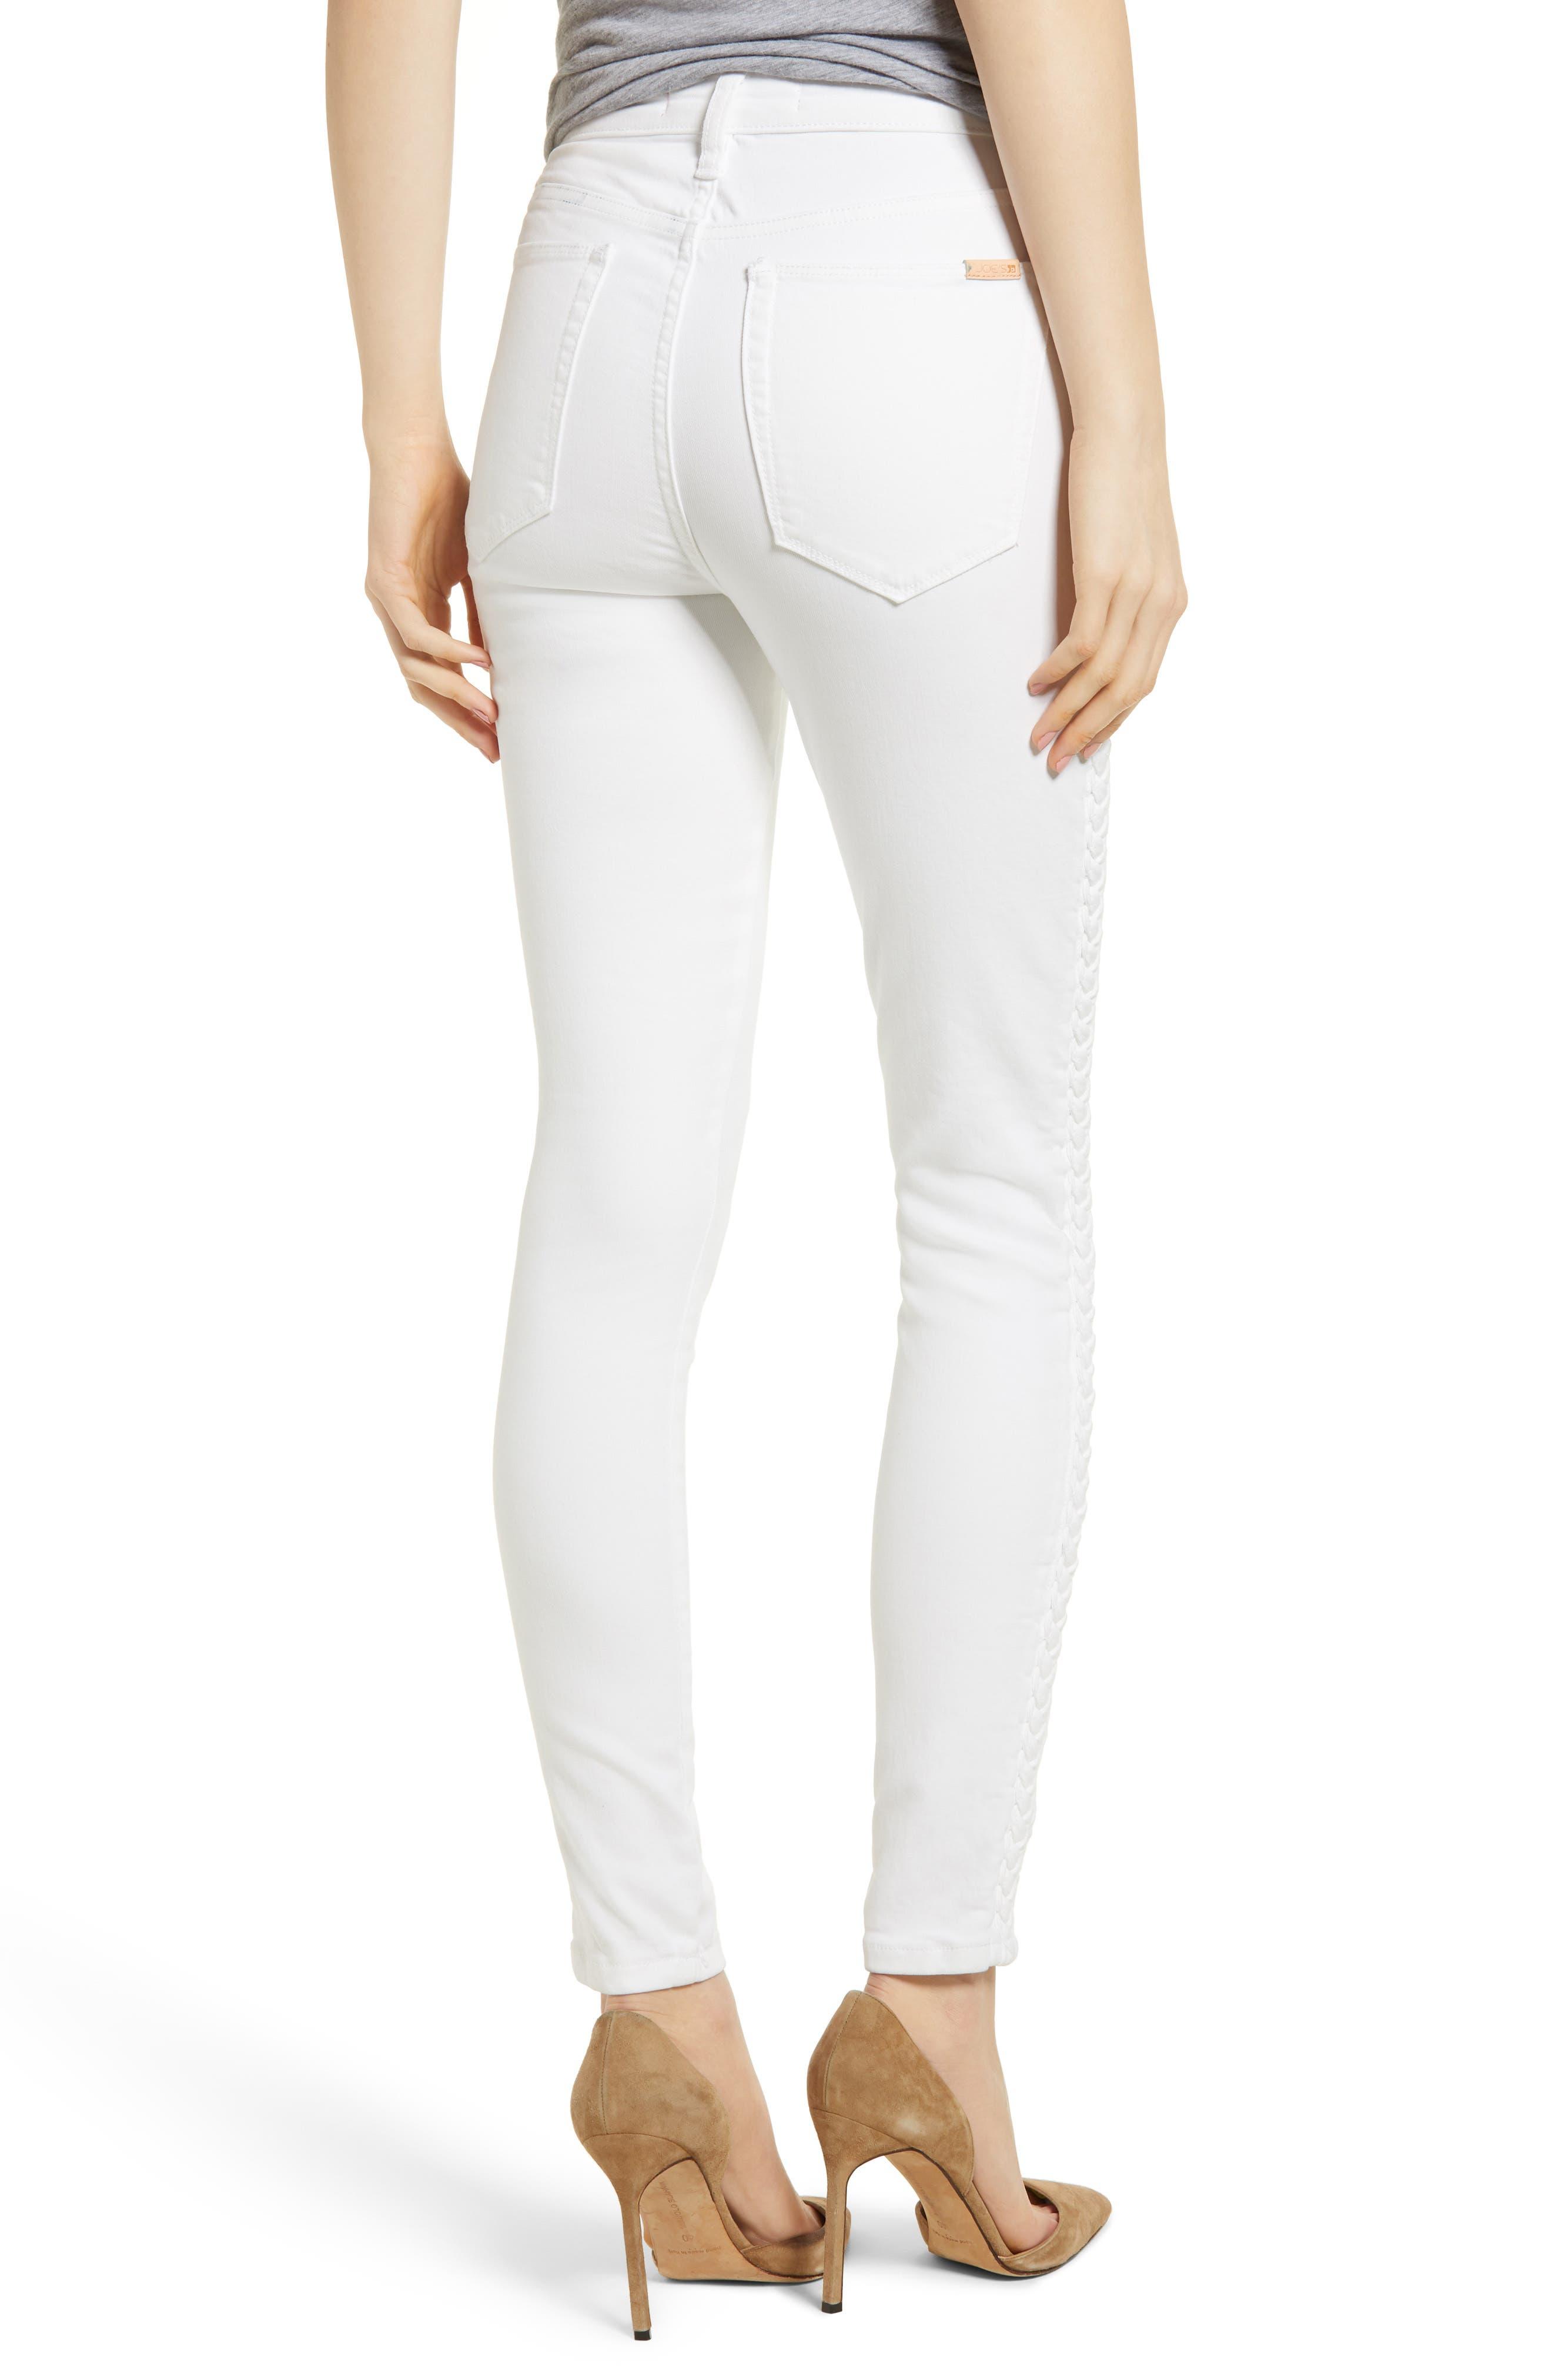 Charlie High Waist Skinny Jeans,                             Alternate thumbnail 2, color,                             PORSCHA